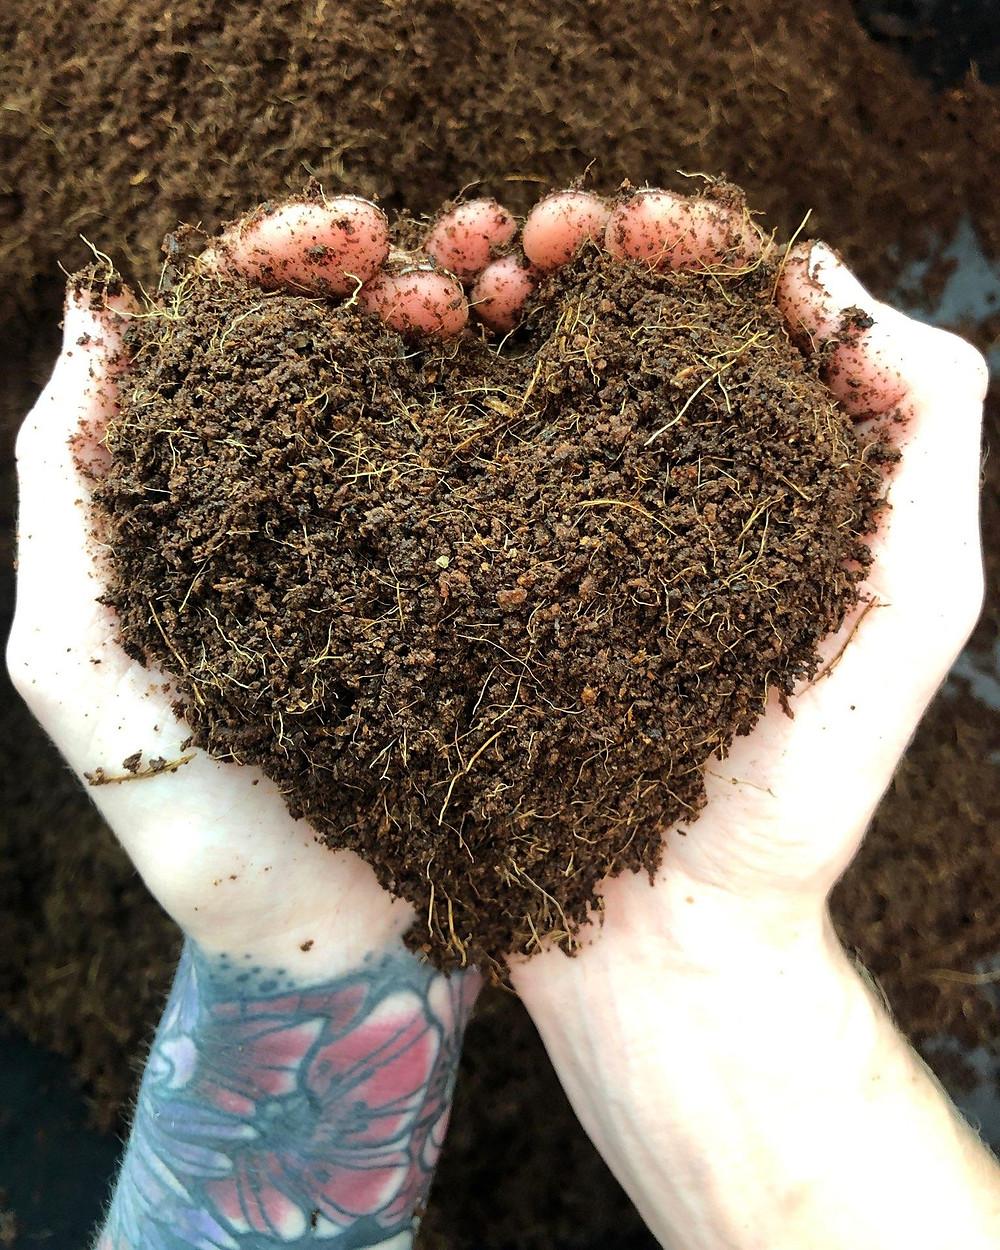 Mandi Warbington Co Owner of On The Grow, LLC holding Hydroponic Microgreens grow Medium Cococoir in the shape of a heart